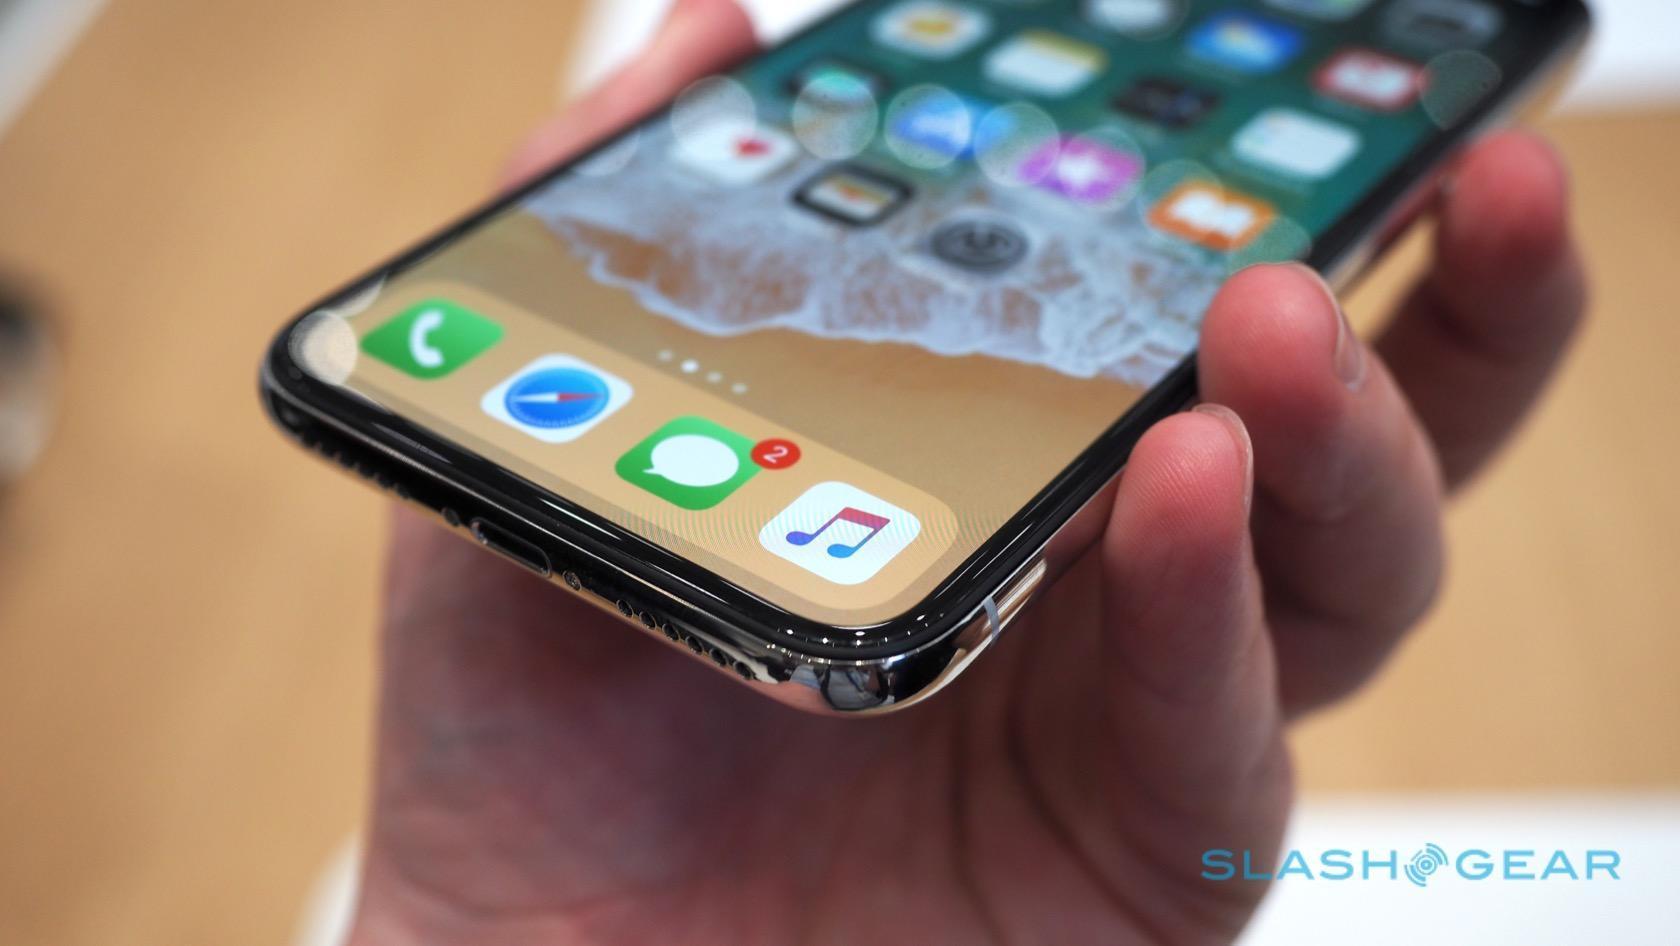 The iPhone X has the best smartphone display around - SlashGear